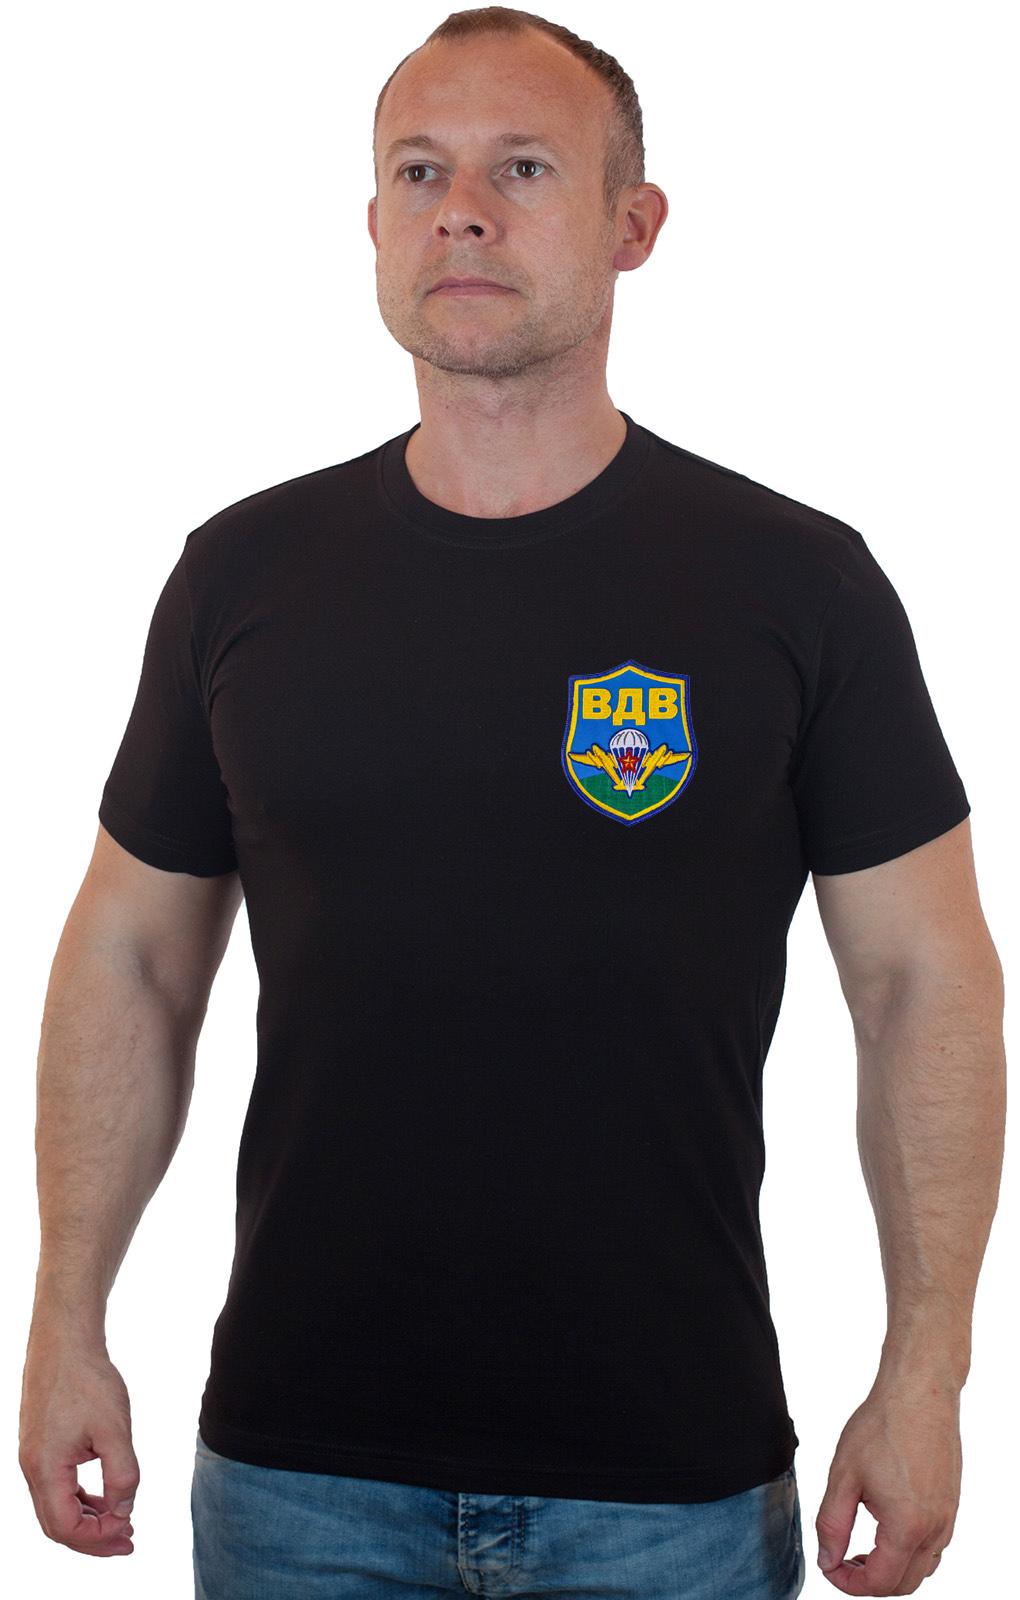 Купить в военторге Военпро мужскую футболку ВДВ